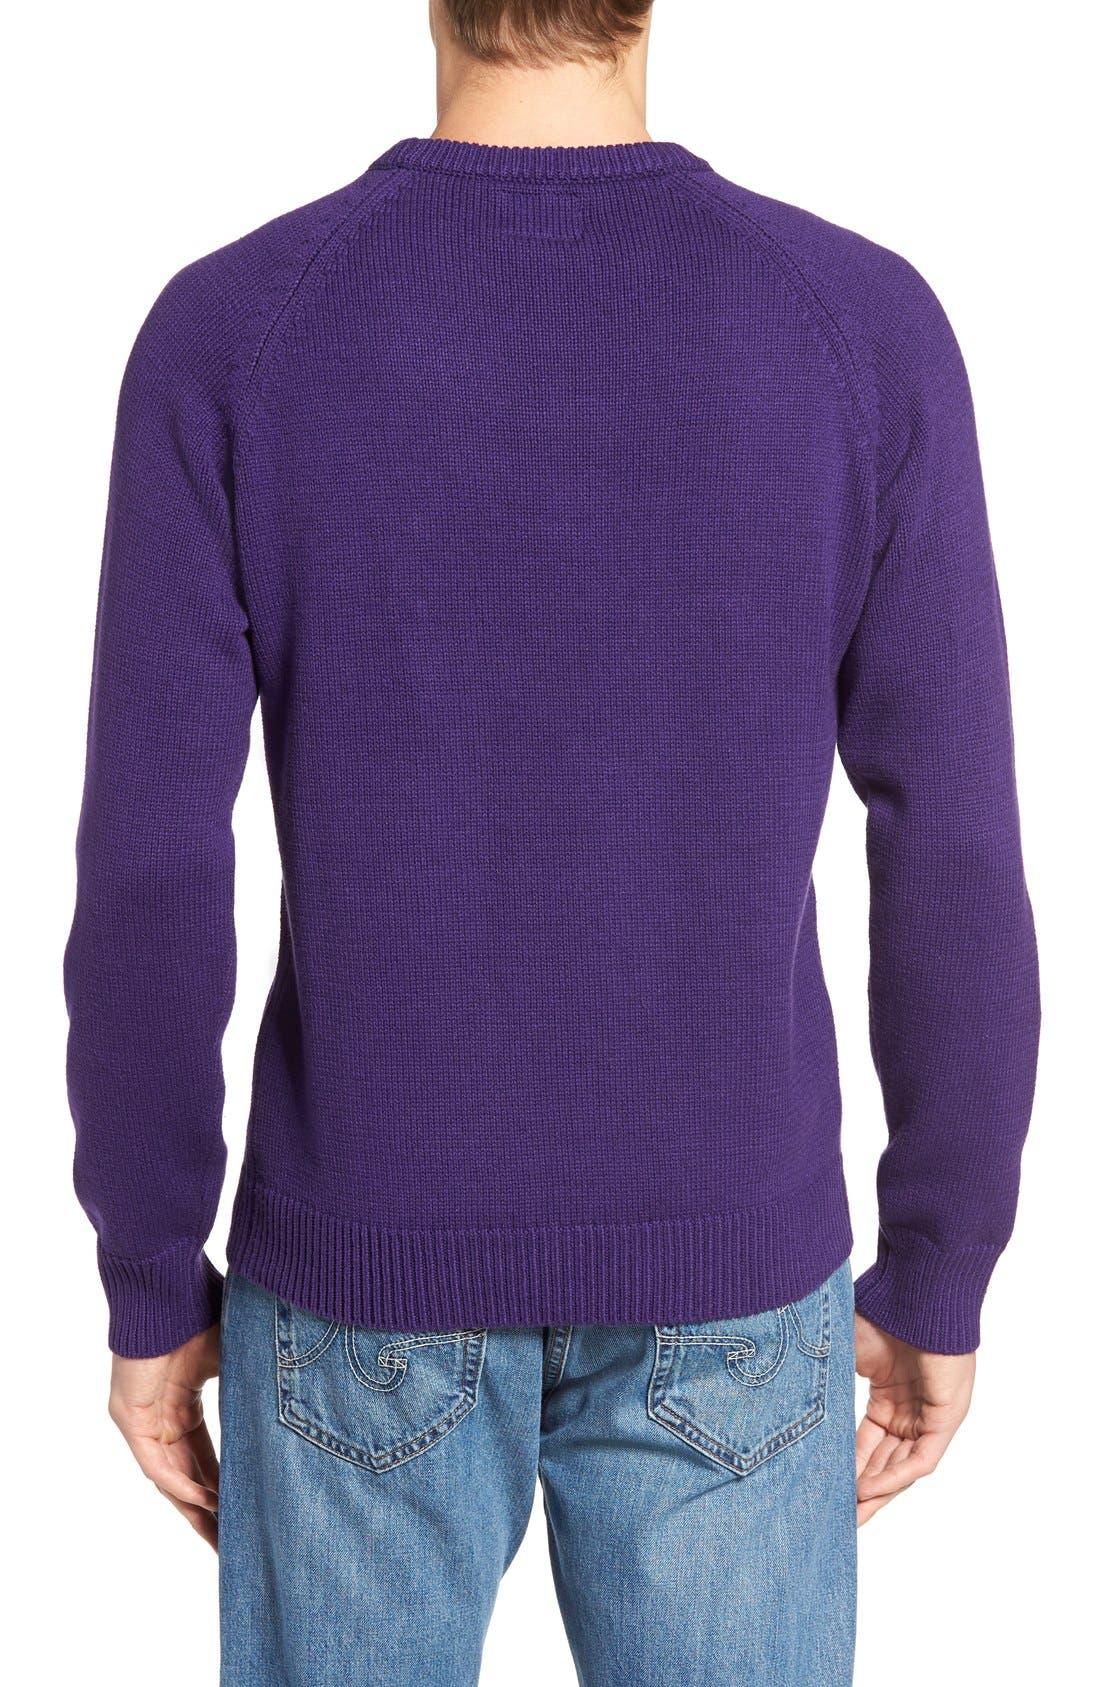 HILLFLINT,                             TCU Heritage Sweater,                             Alternate thumbnail 2, color,                             500